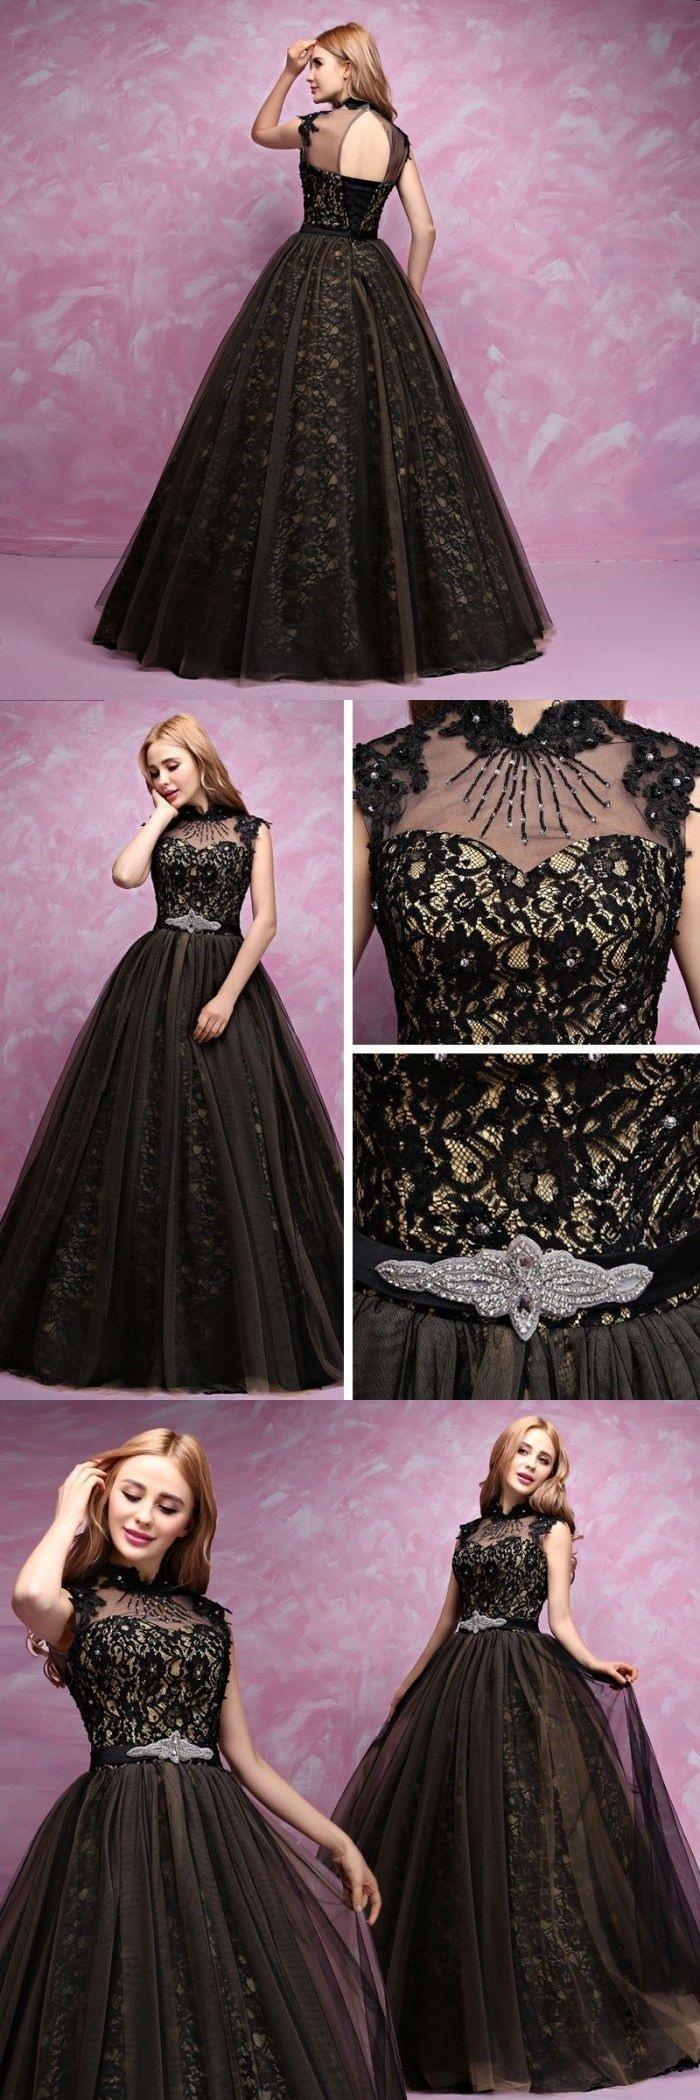 Formal Großartig Elegante Damenkleider Boutique17 Einzigartig Elegante Damenkleider Vertrieb